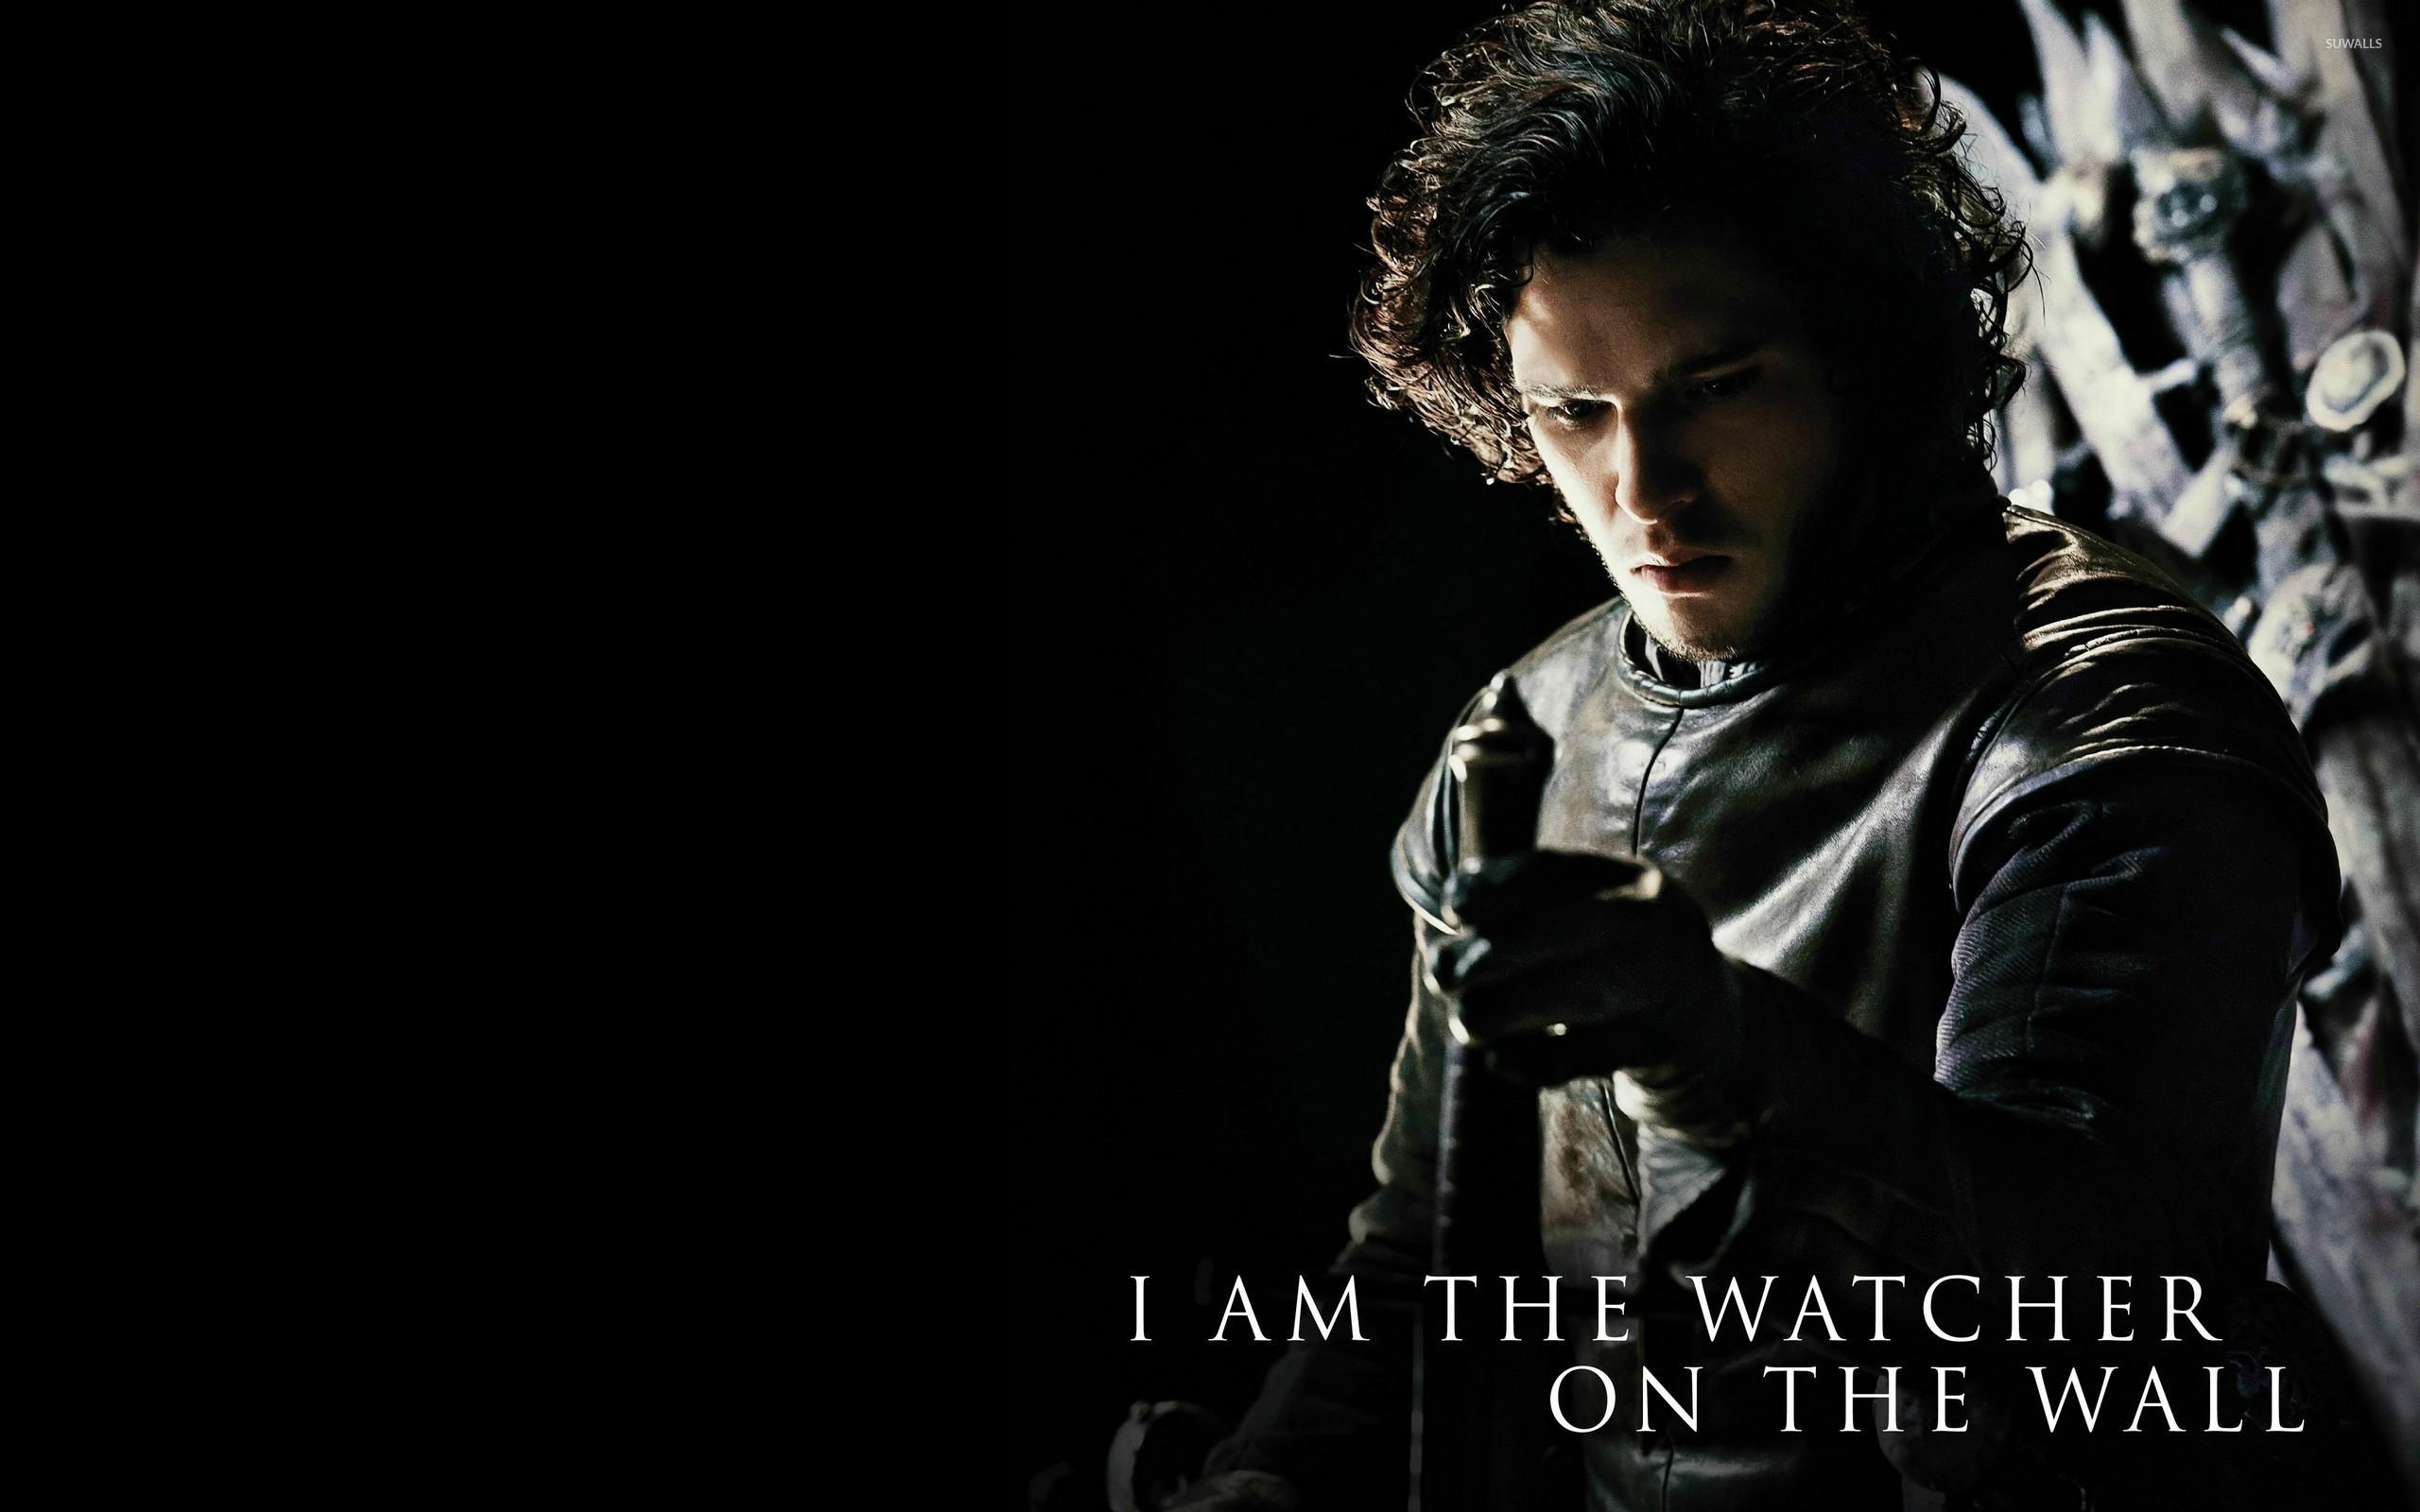 Popolare Jon Snow - Game of Thrones wallpaper - TV Show wallpapers - #28606 VA78